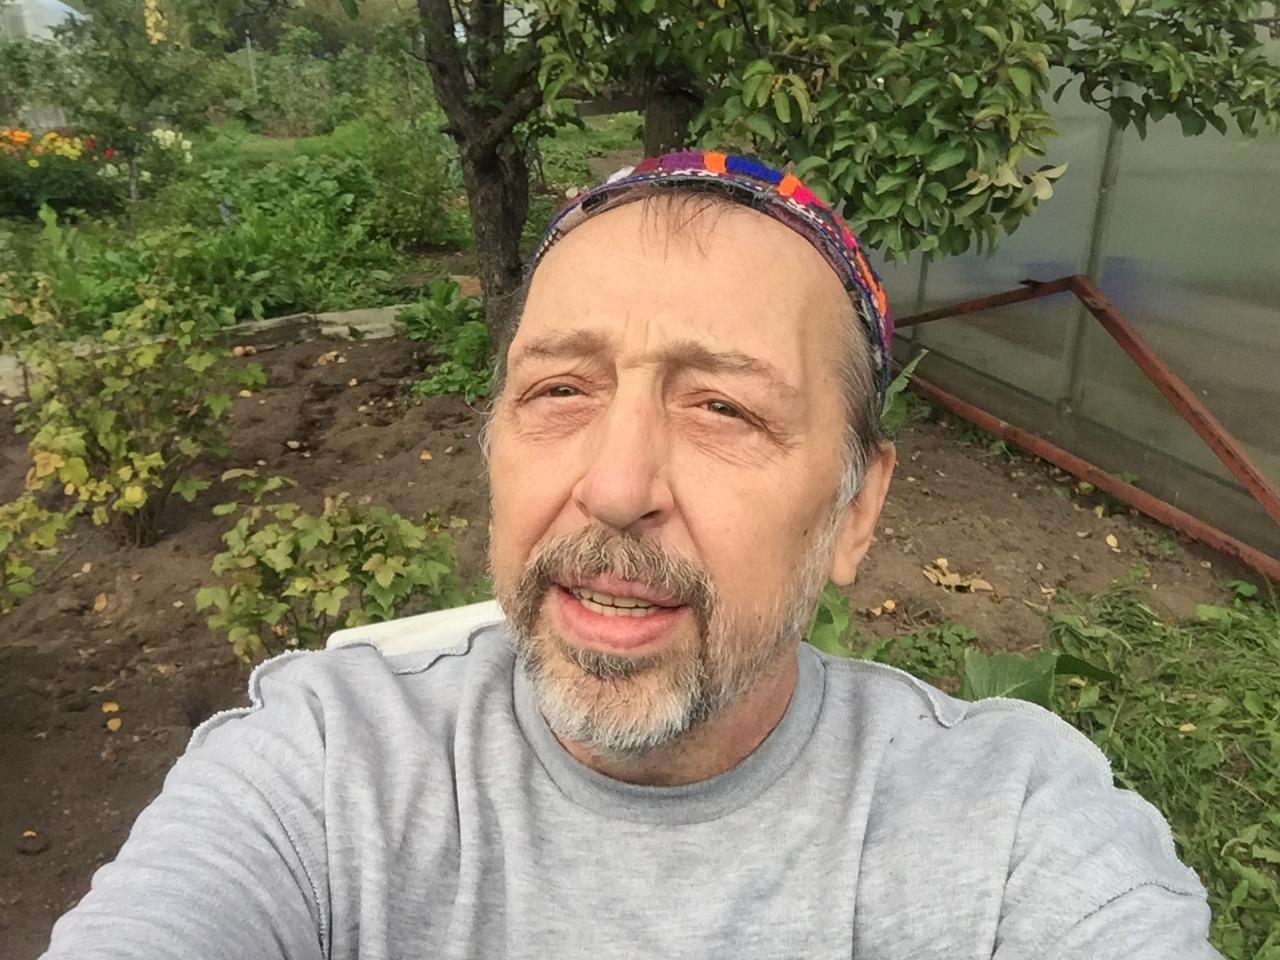 Драматург Николай Коляда объявил об эмиграции